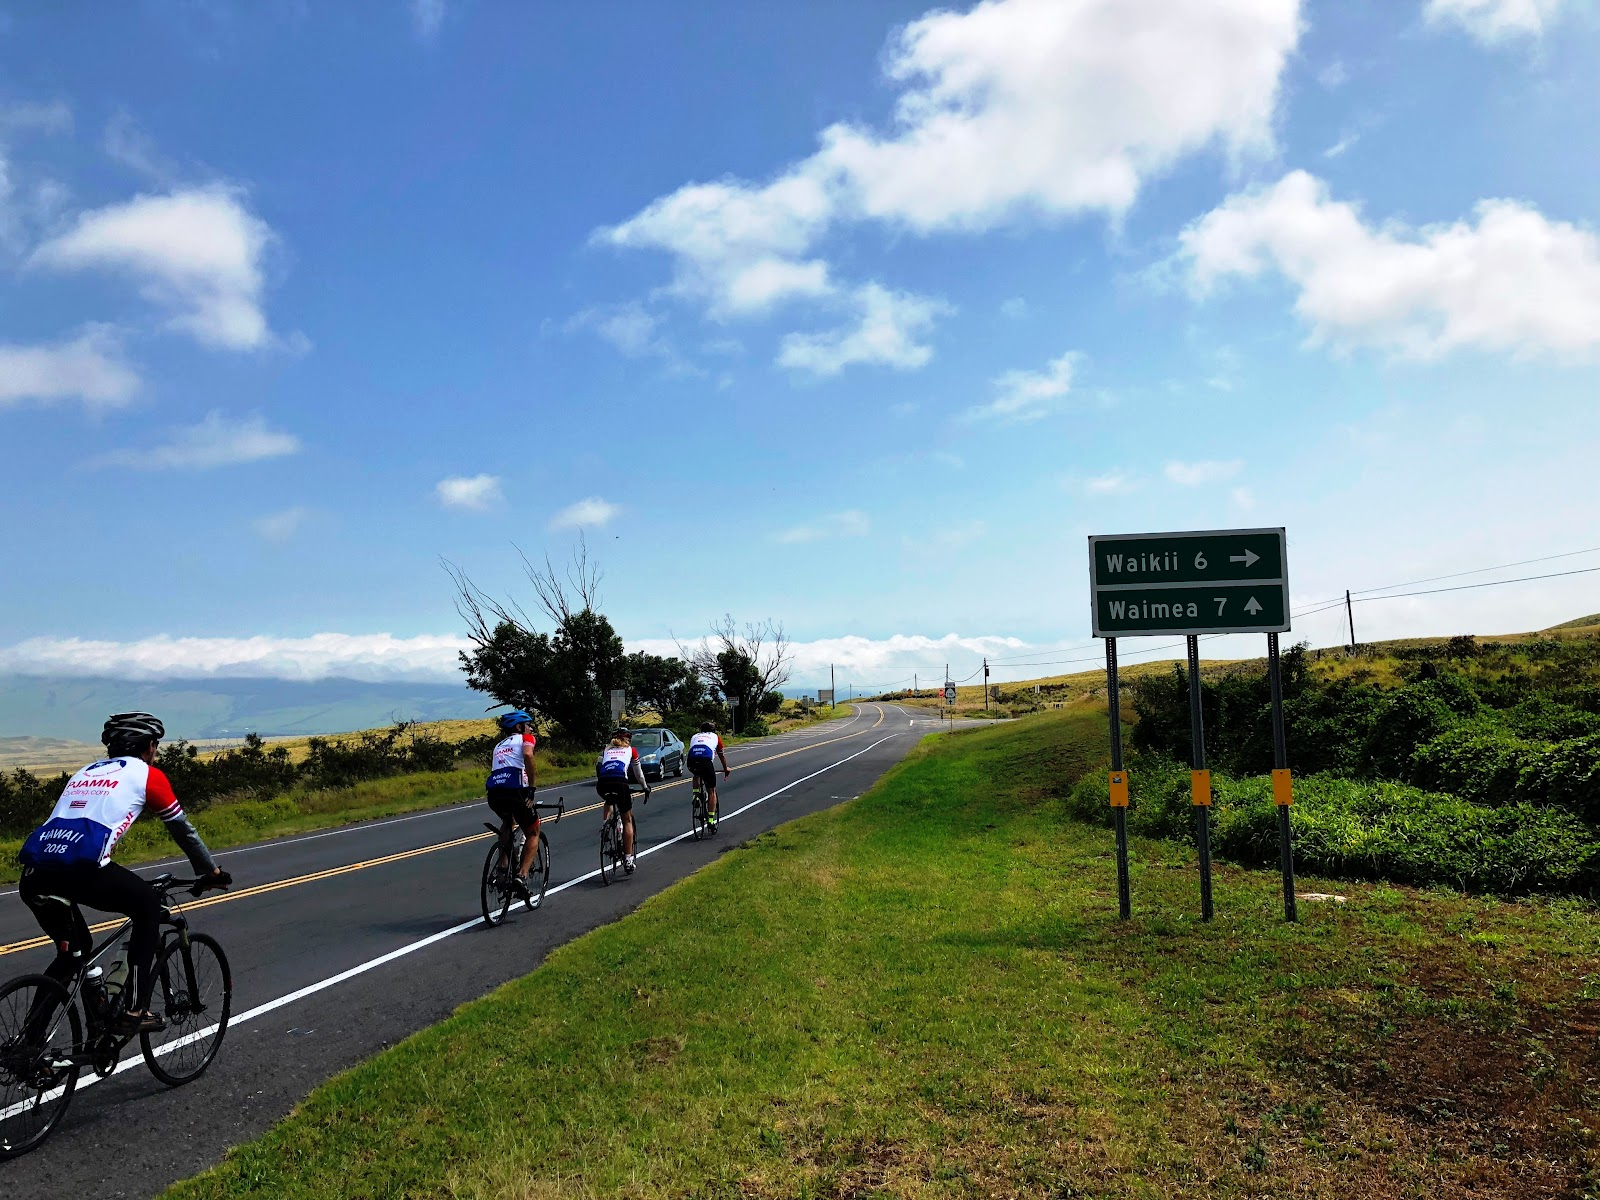 Climbing Mauna Loa Volcano by bike  - cyclists on Hwy 190